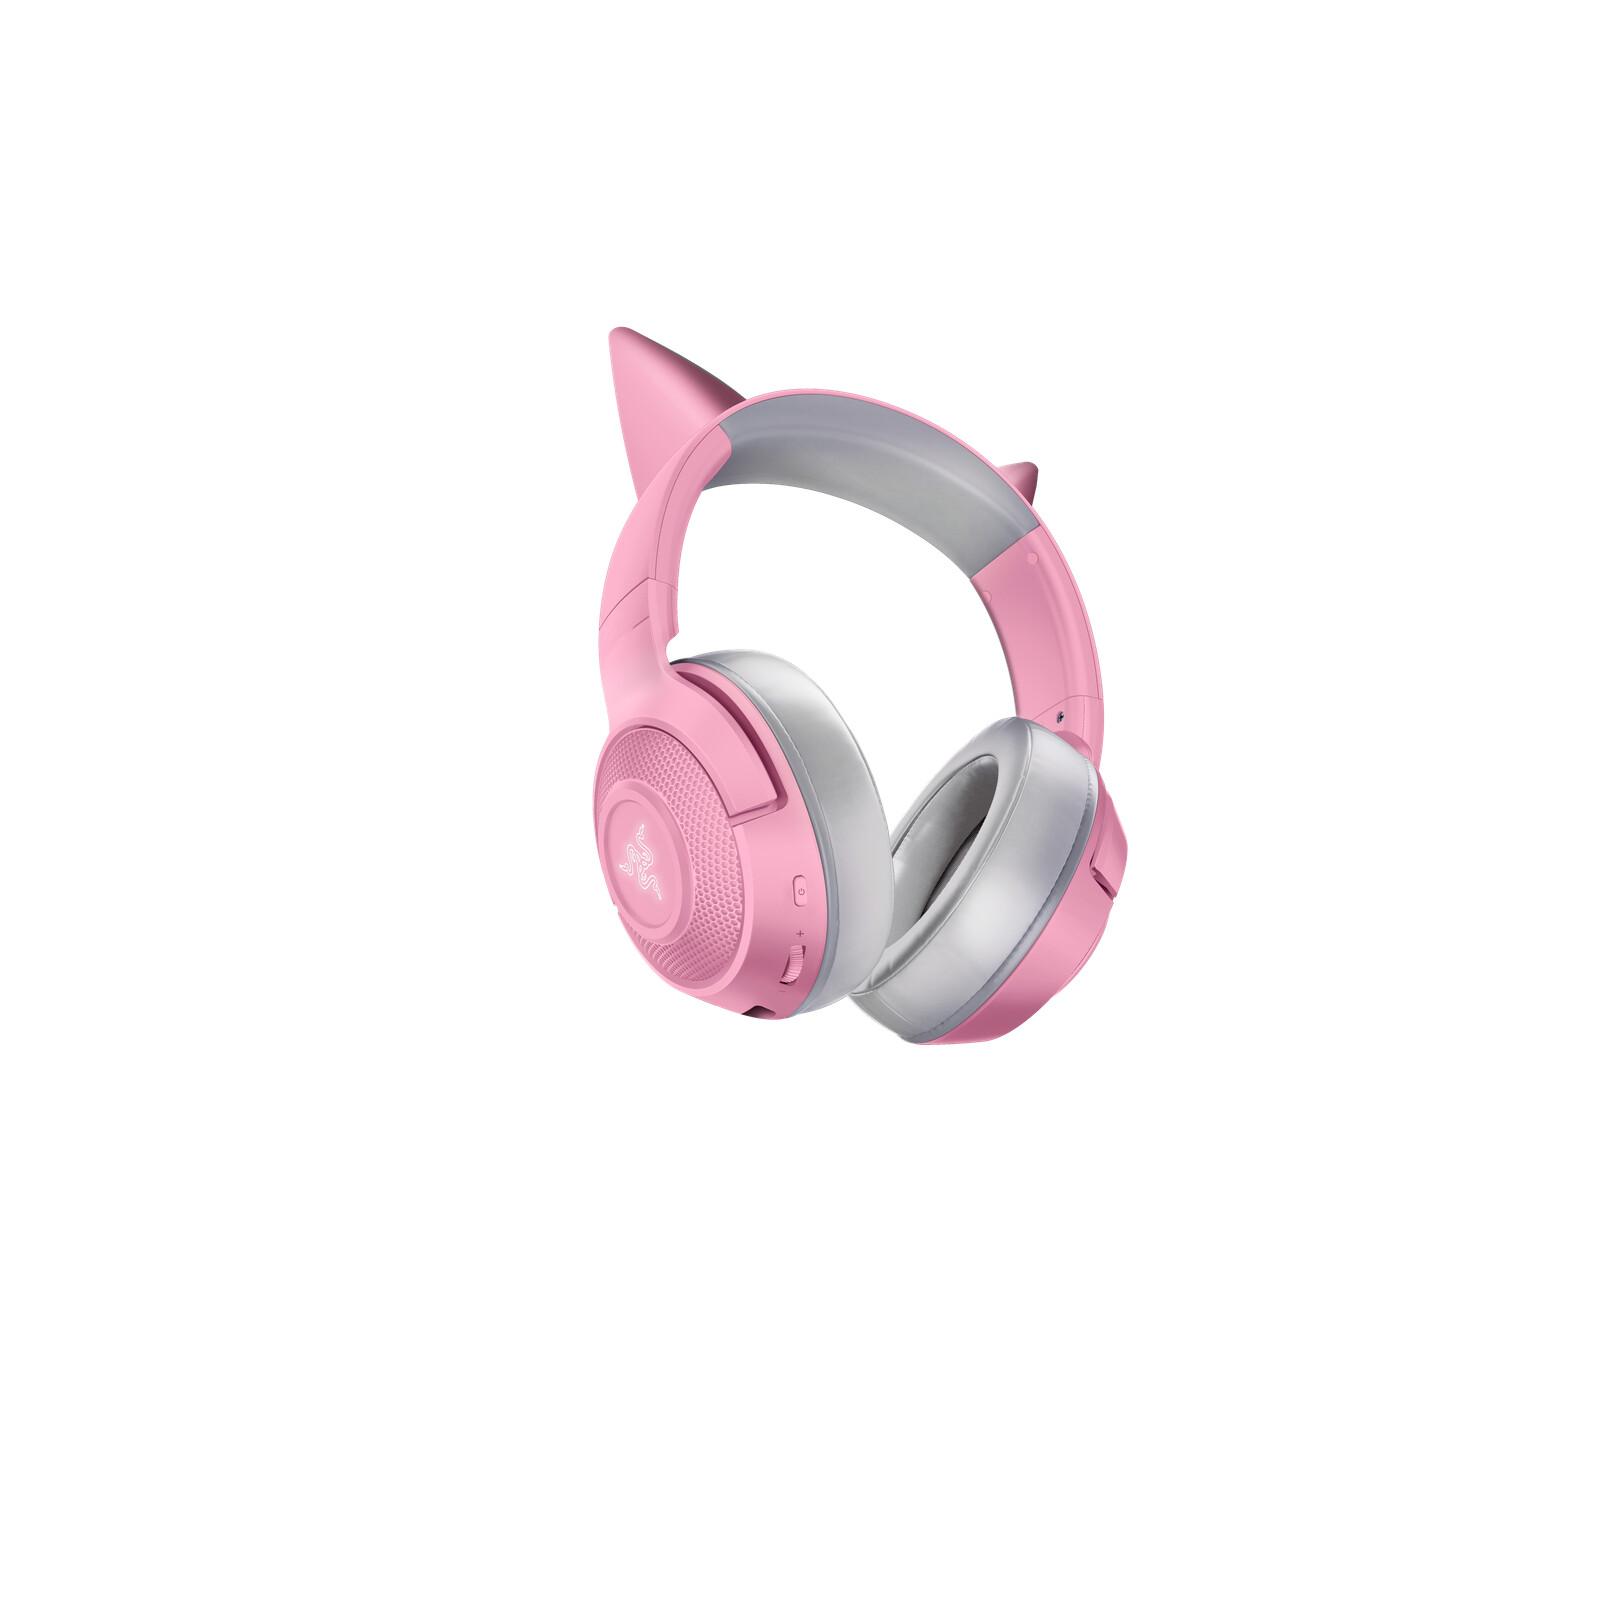 Razer Kraken BT Headset - Kitty Edition - Quartz